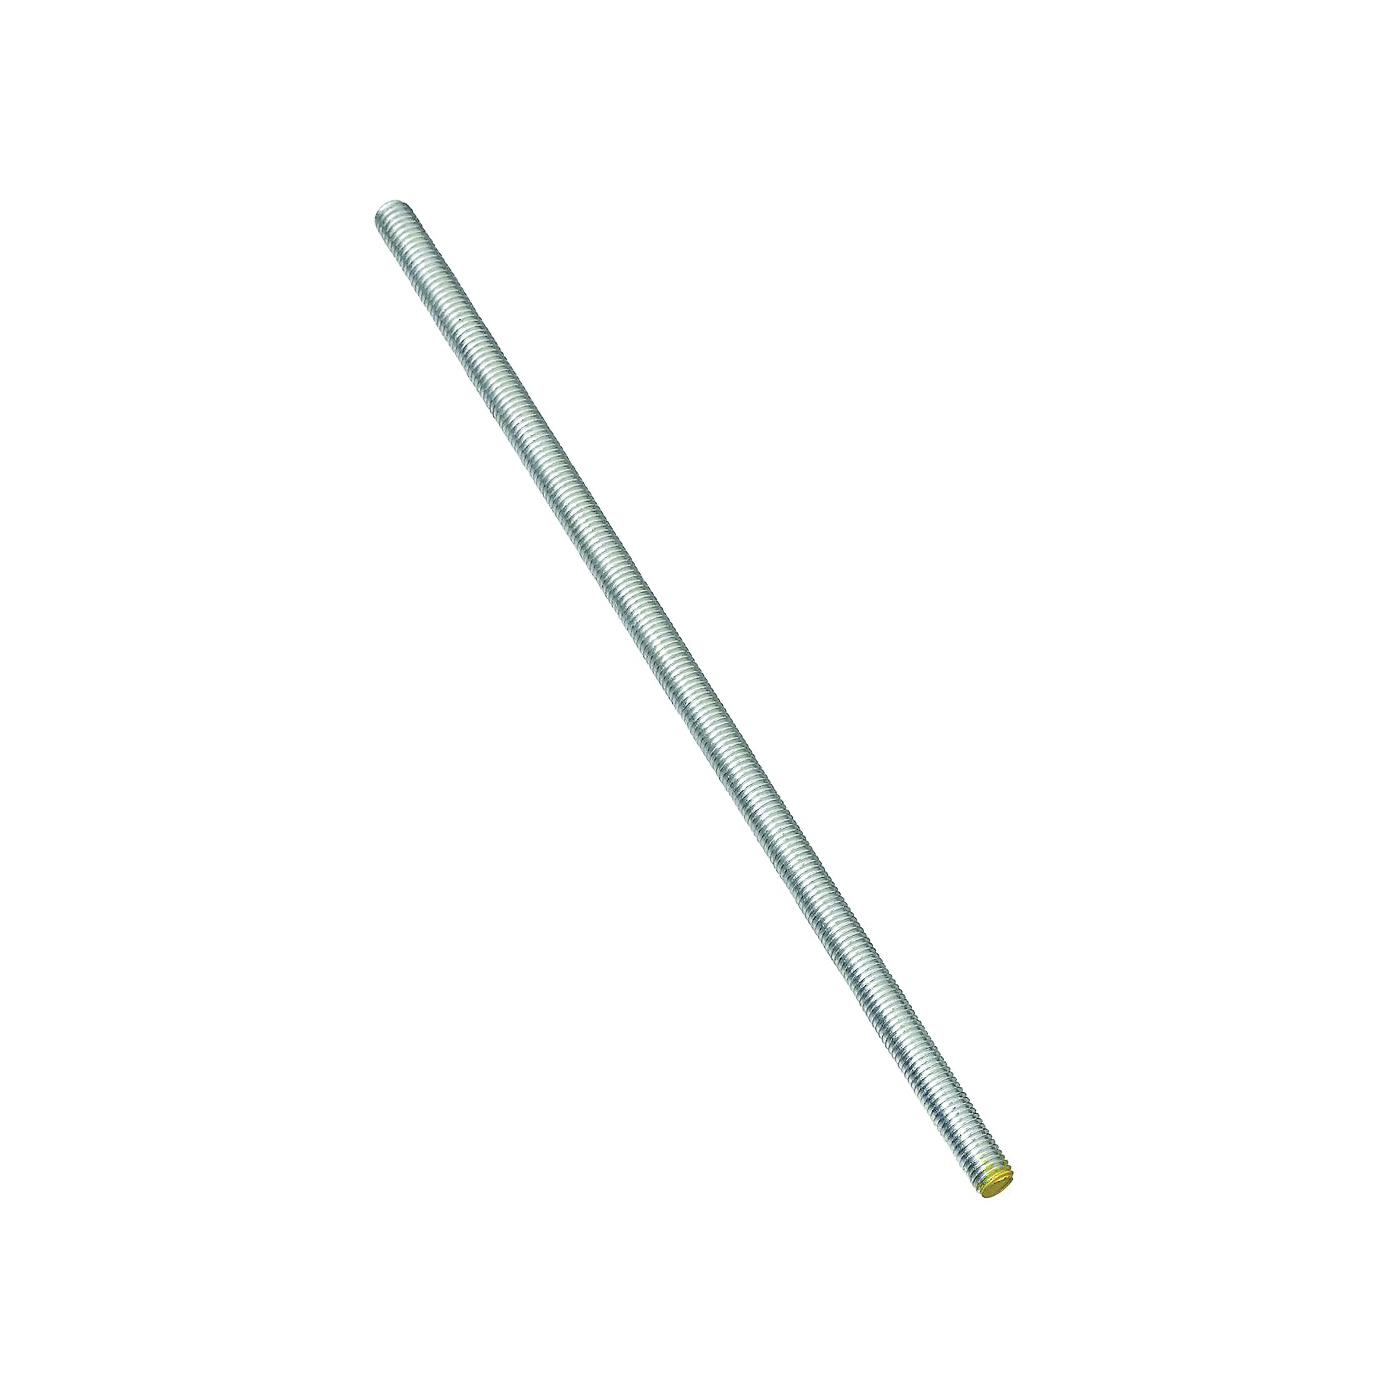 Picture of Stanley Hardware 179432 Threaded Rod, 3/8-16 Thread, 24 in L, A Grade, Steel, Zinc, UNC Thread